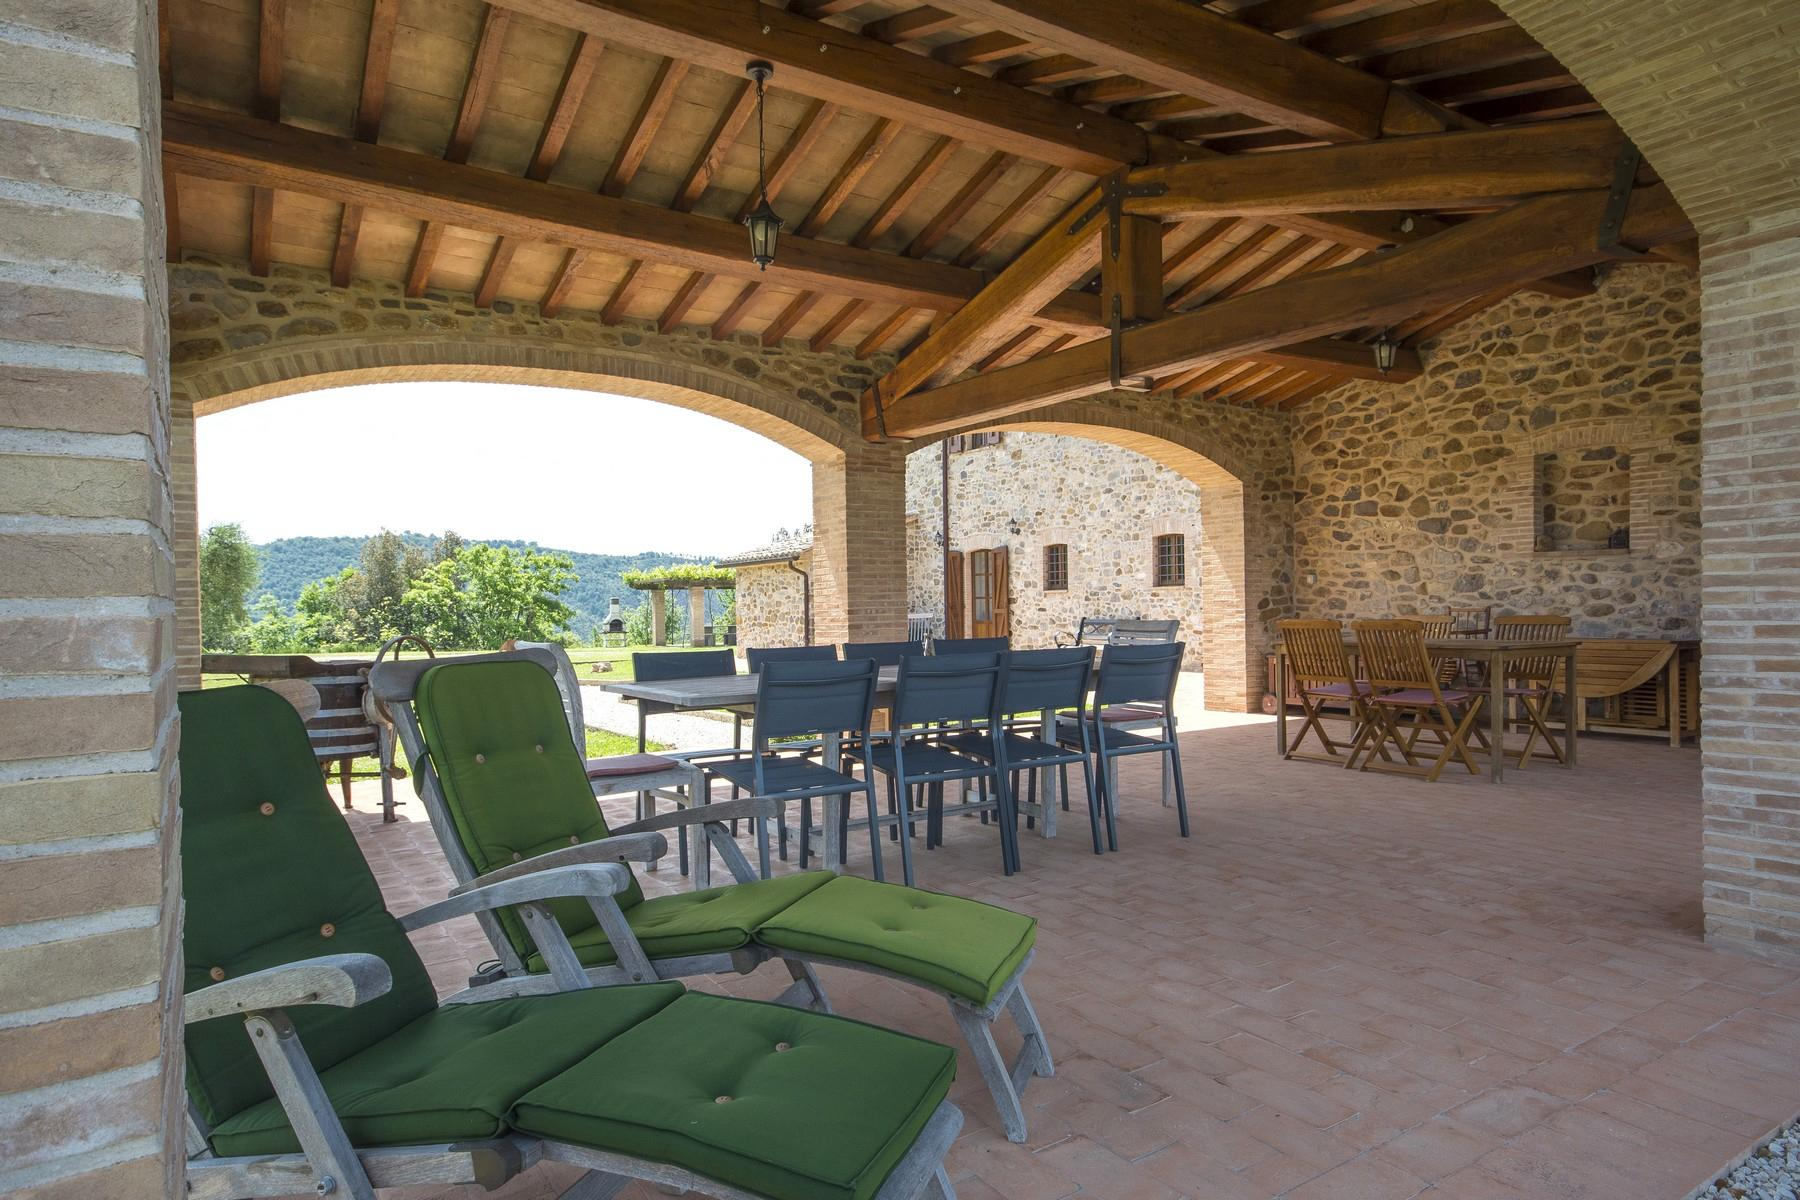 Eccezionale proprietà tra Toscana e Umbria - 7